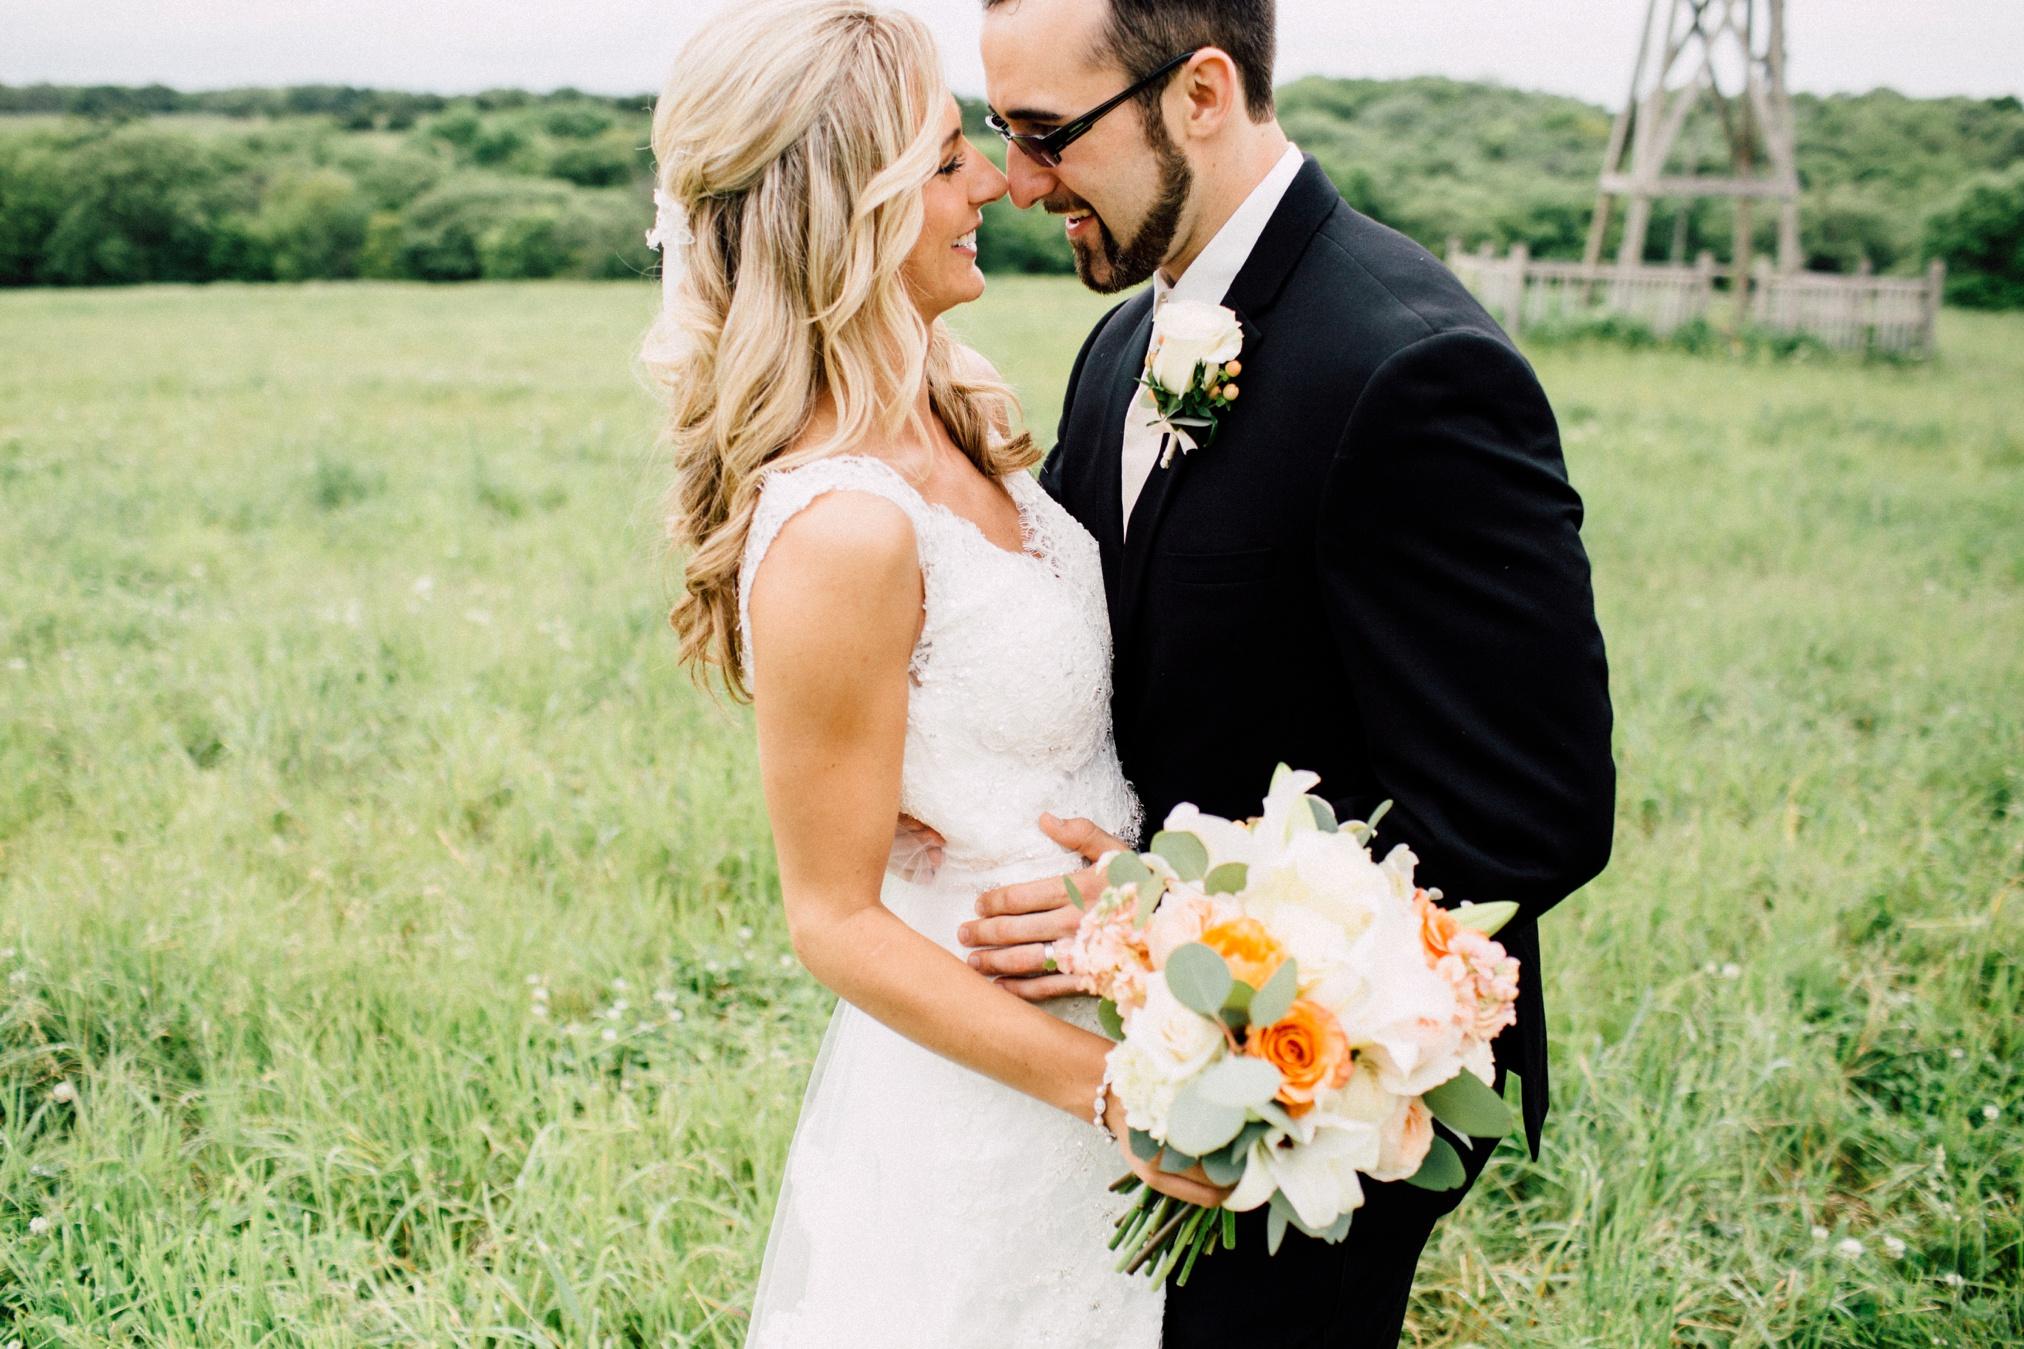 schmid_wedding-634.jpg